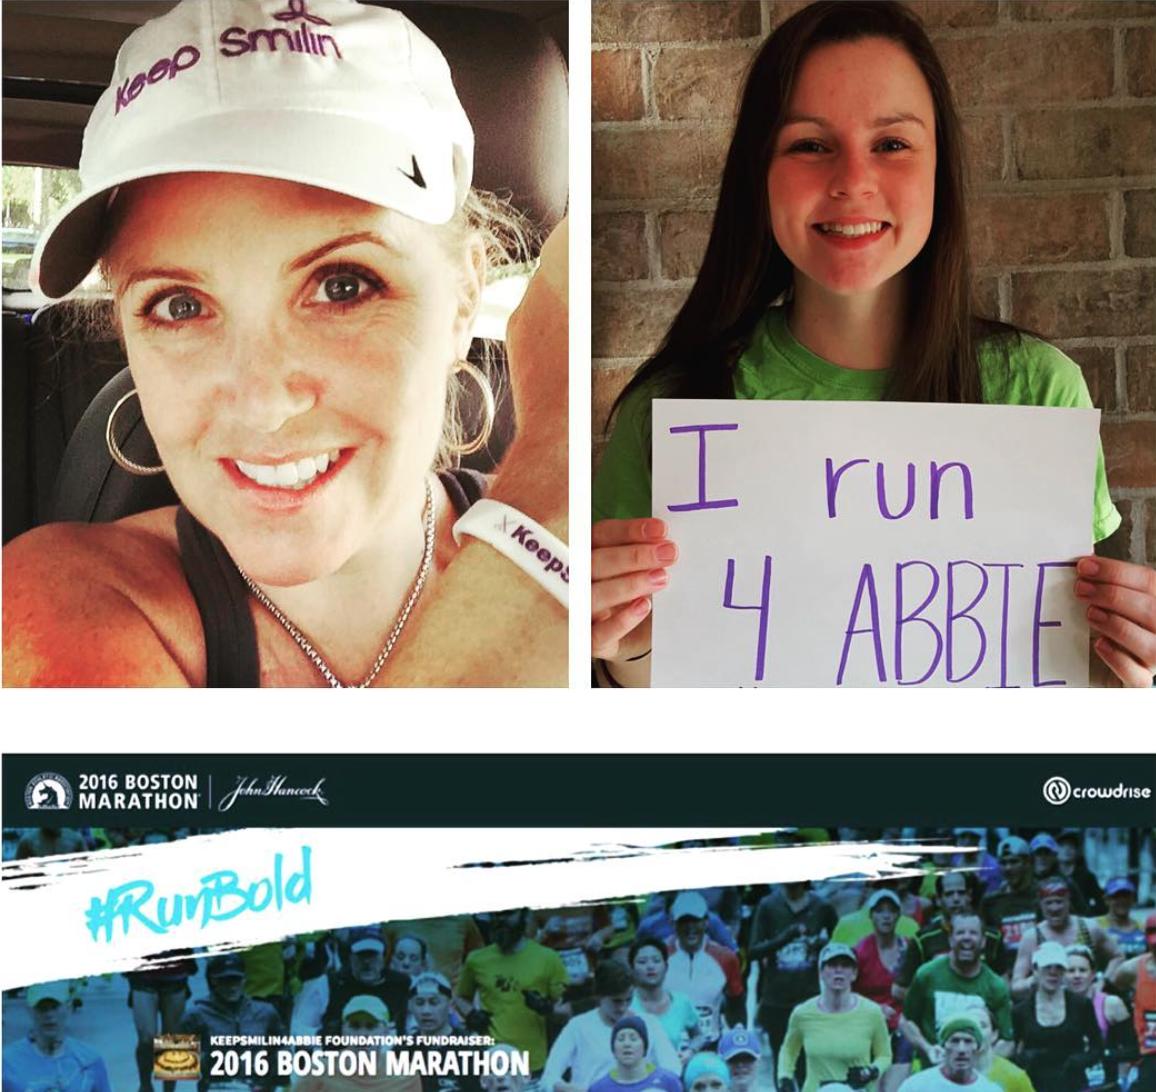 Boston Marathon Run to benefit KeepSmilin'